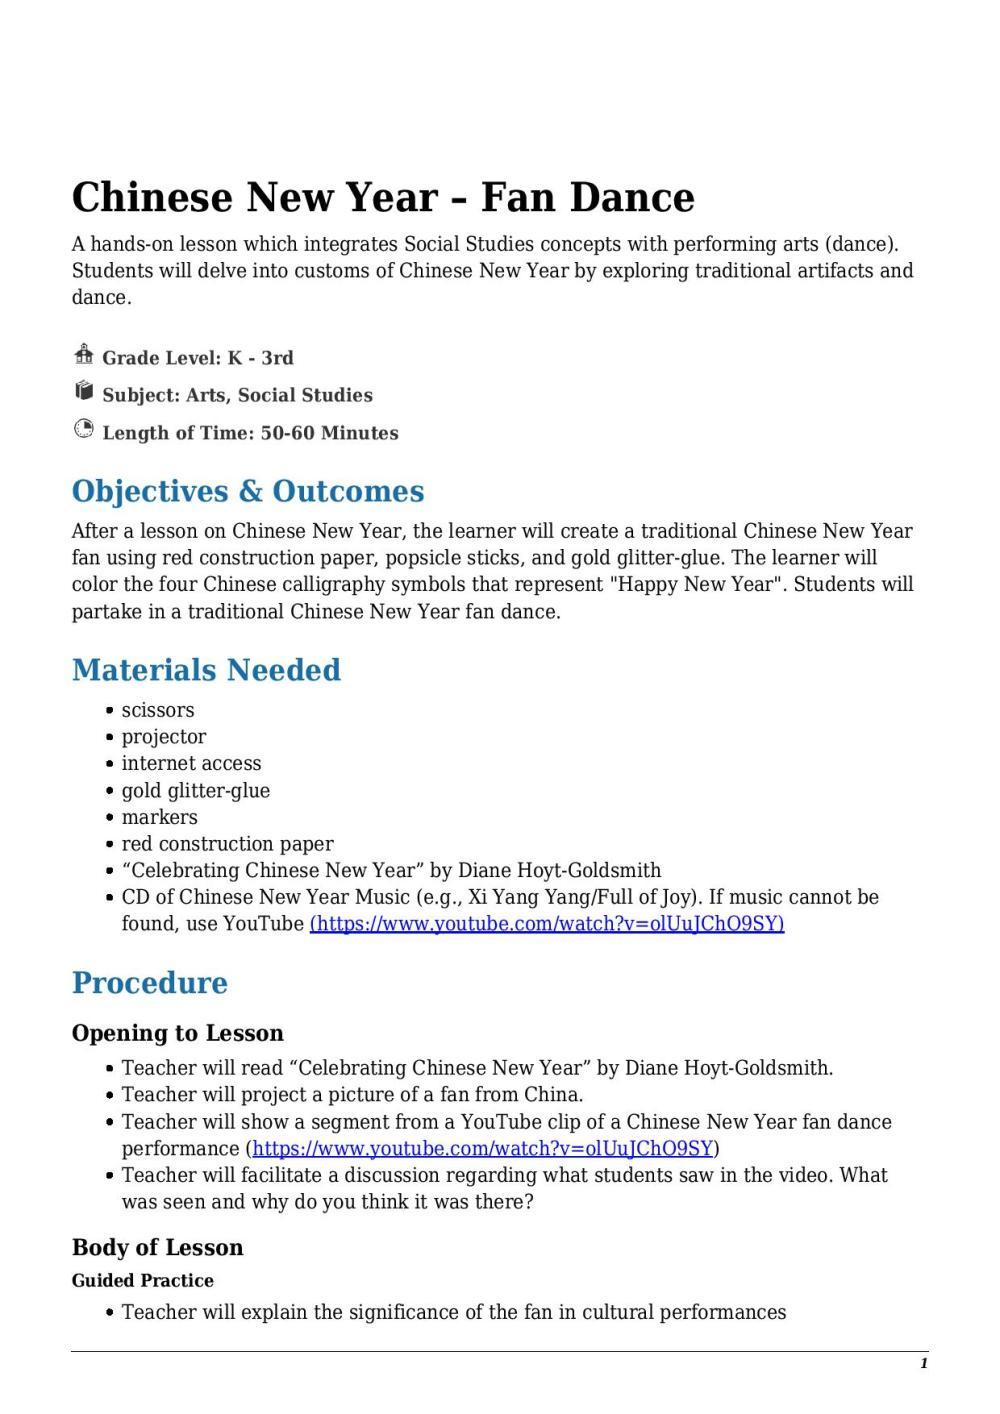 medium resolution of Chinese New Year – Fan Dance Kindergarten - 3rd Grade - Lesson Tutor